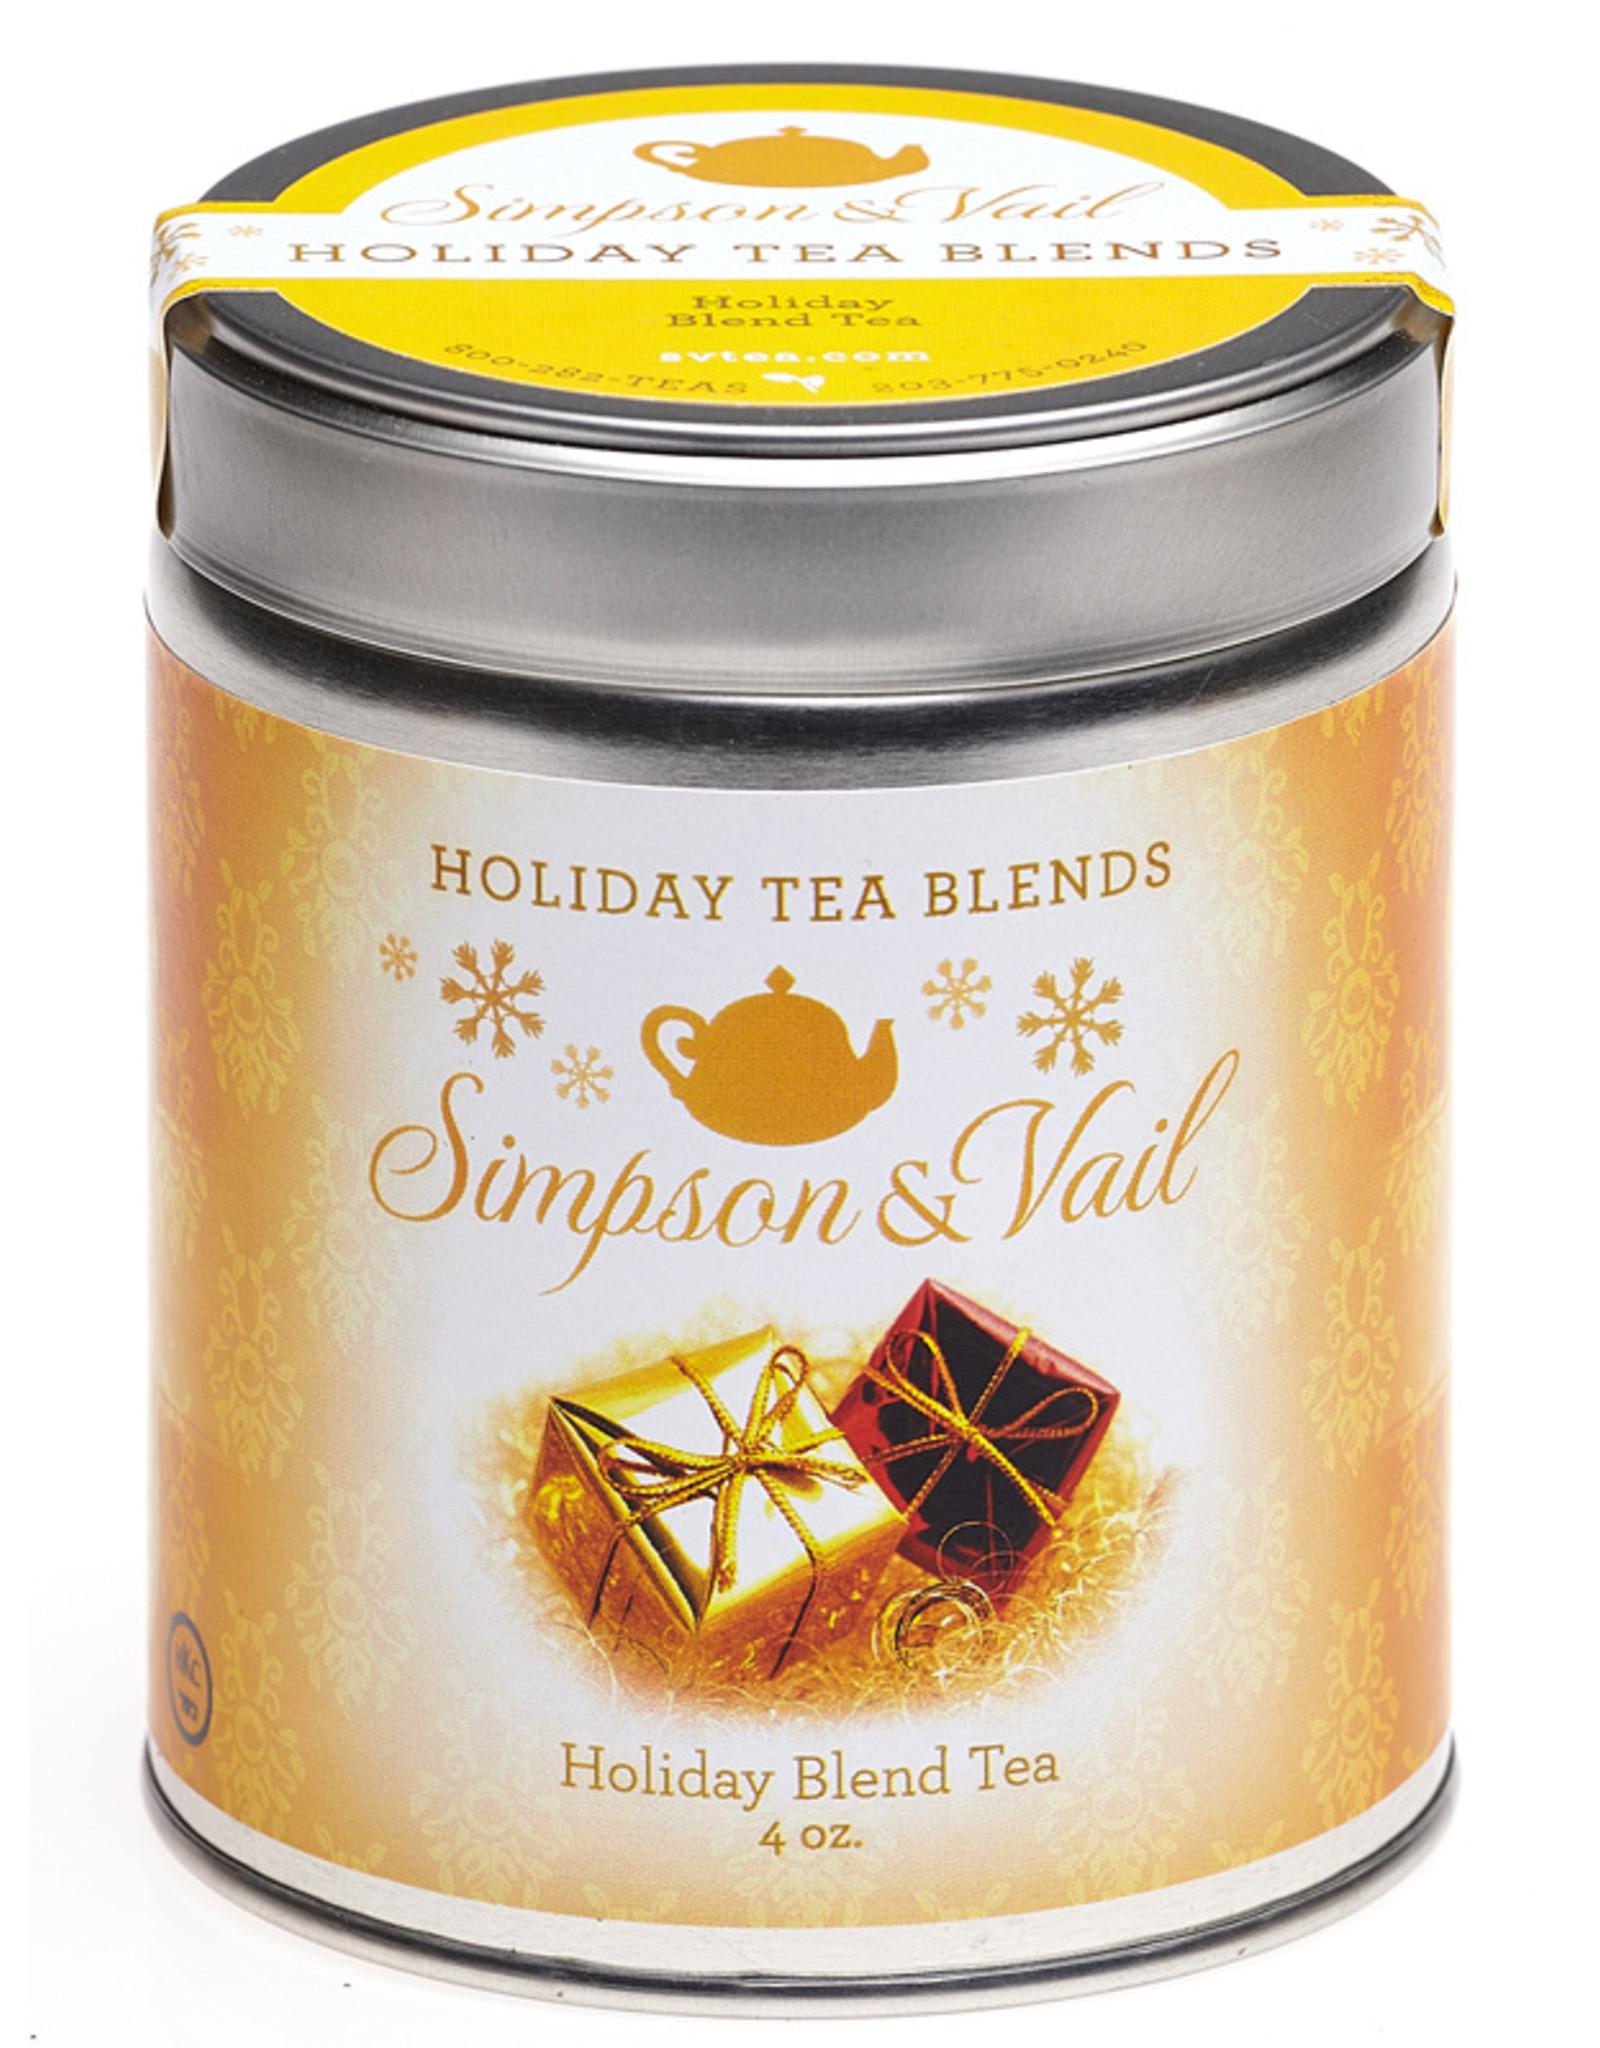 Simpson & Vail Holiday Blend Tea